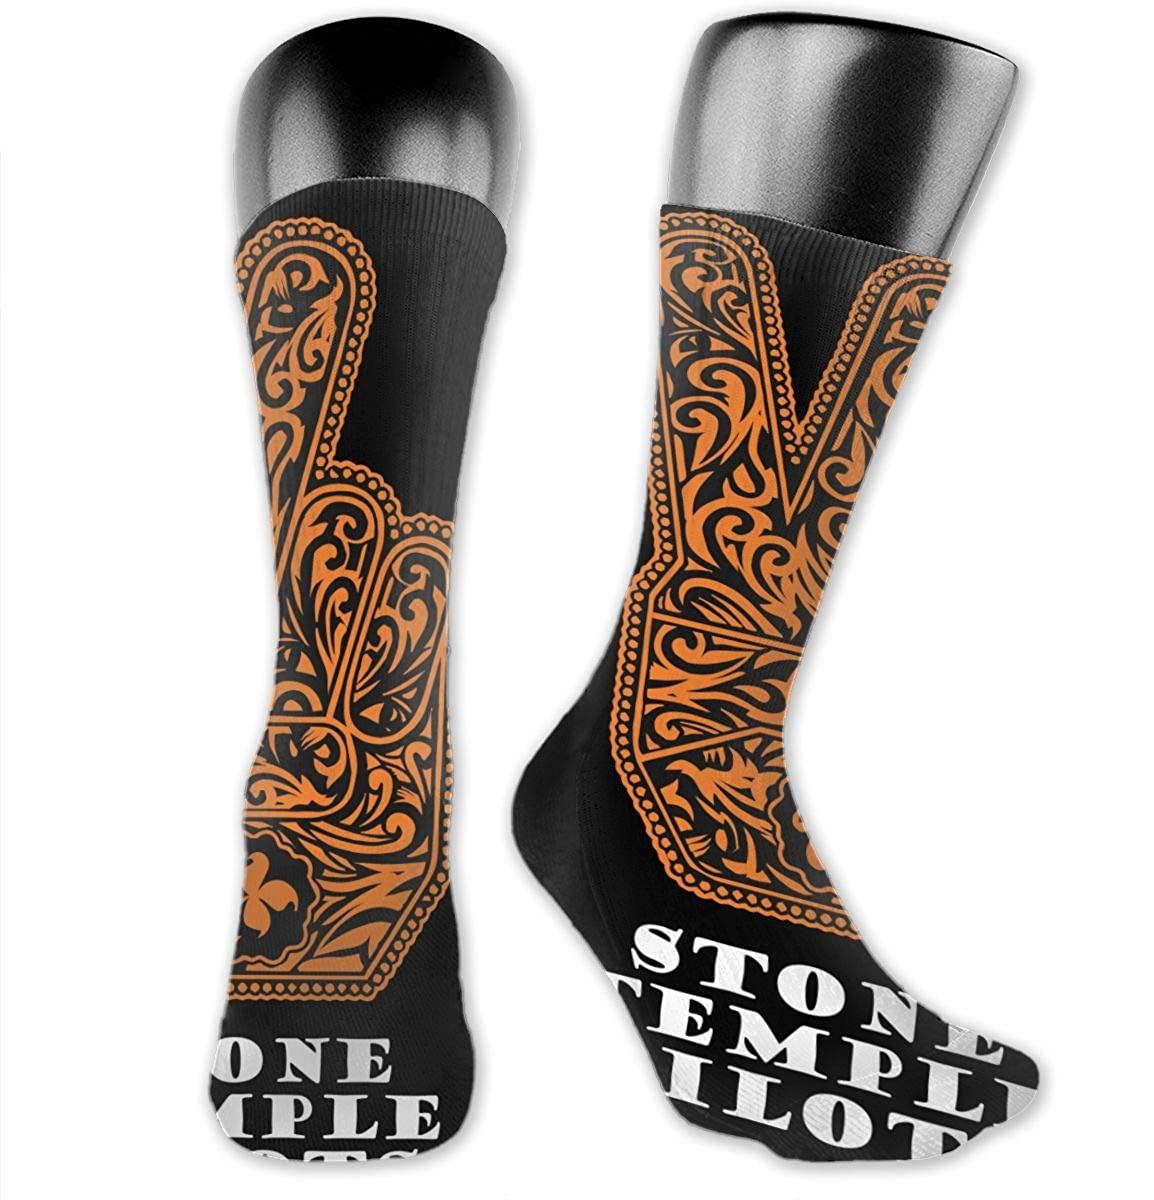 Stone Temple Pilots Medium Long Socks Dress Hose Crew Short Anklet For Workout